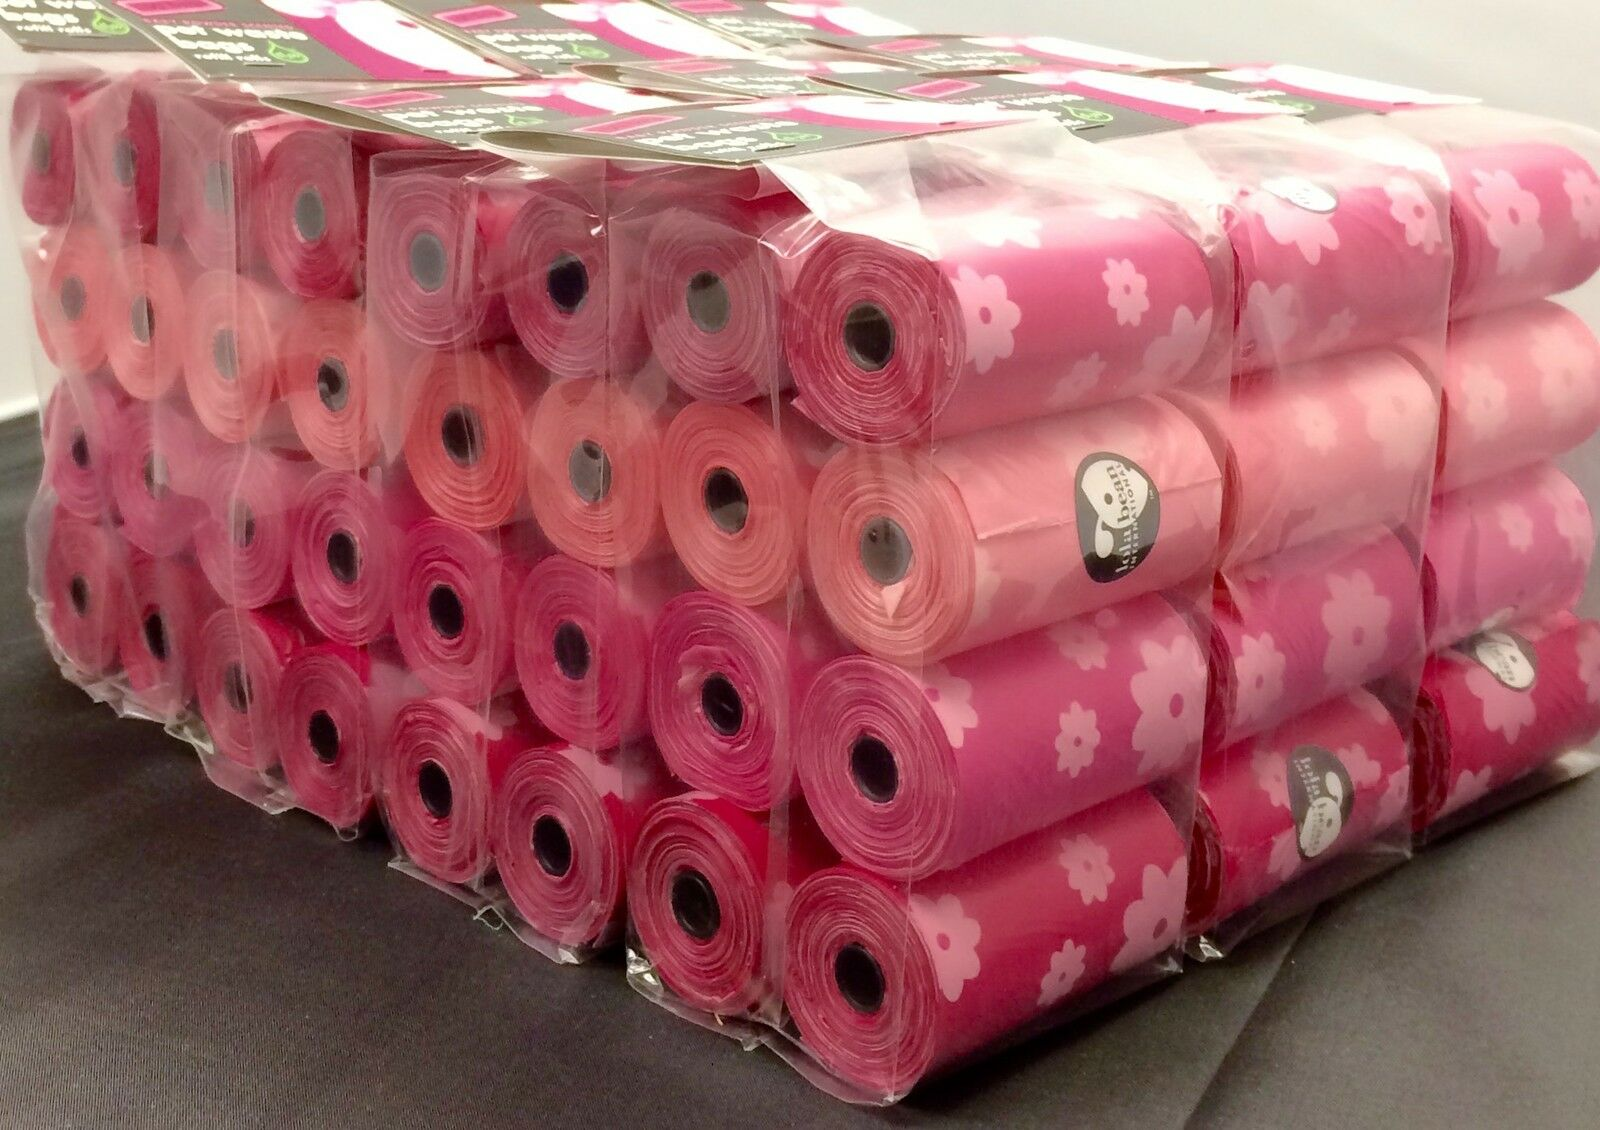 BULK rosa Dog Pet Puppy Poop Waste Pick Up Bags - Refills Rolls 1,920 BAGS